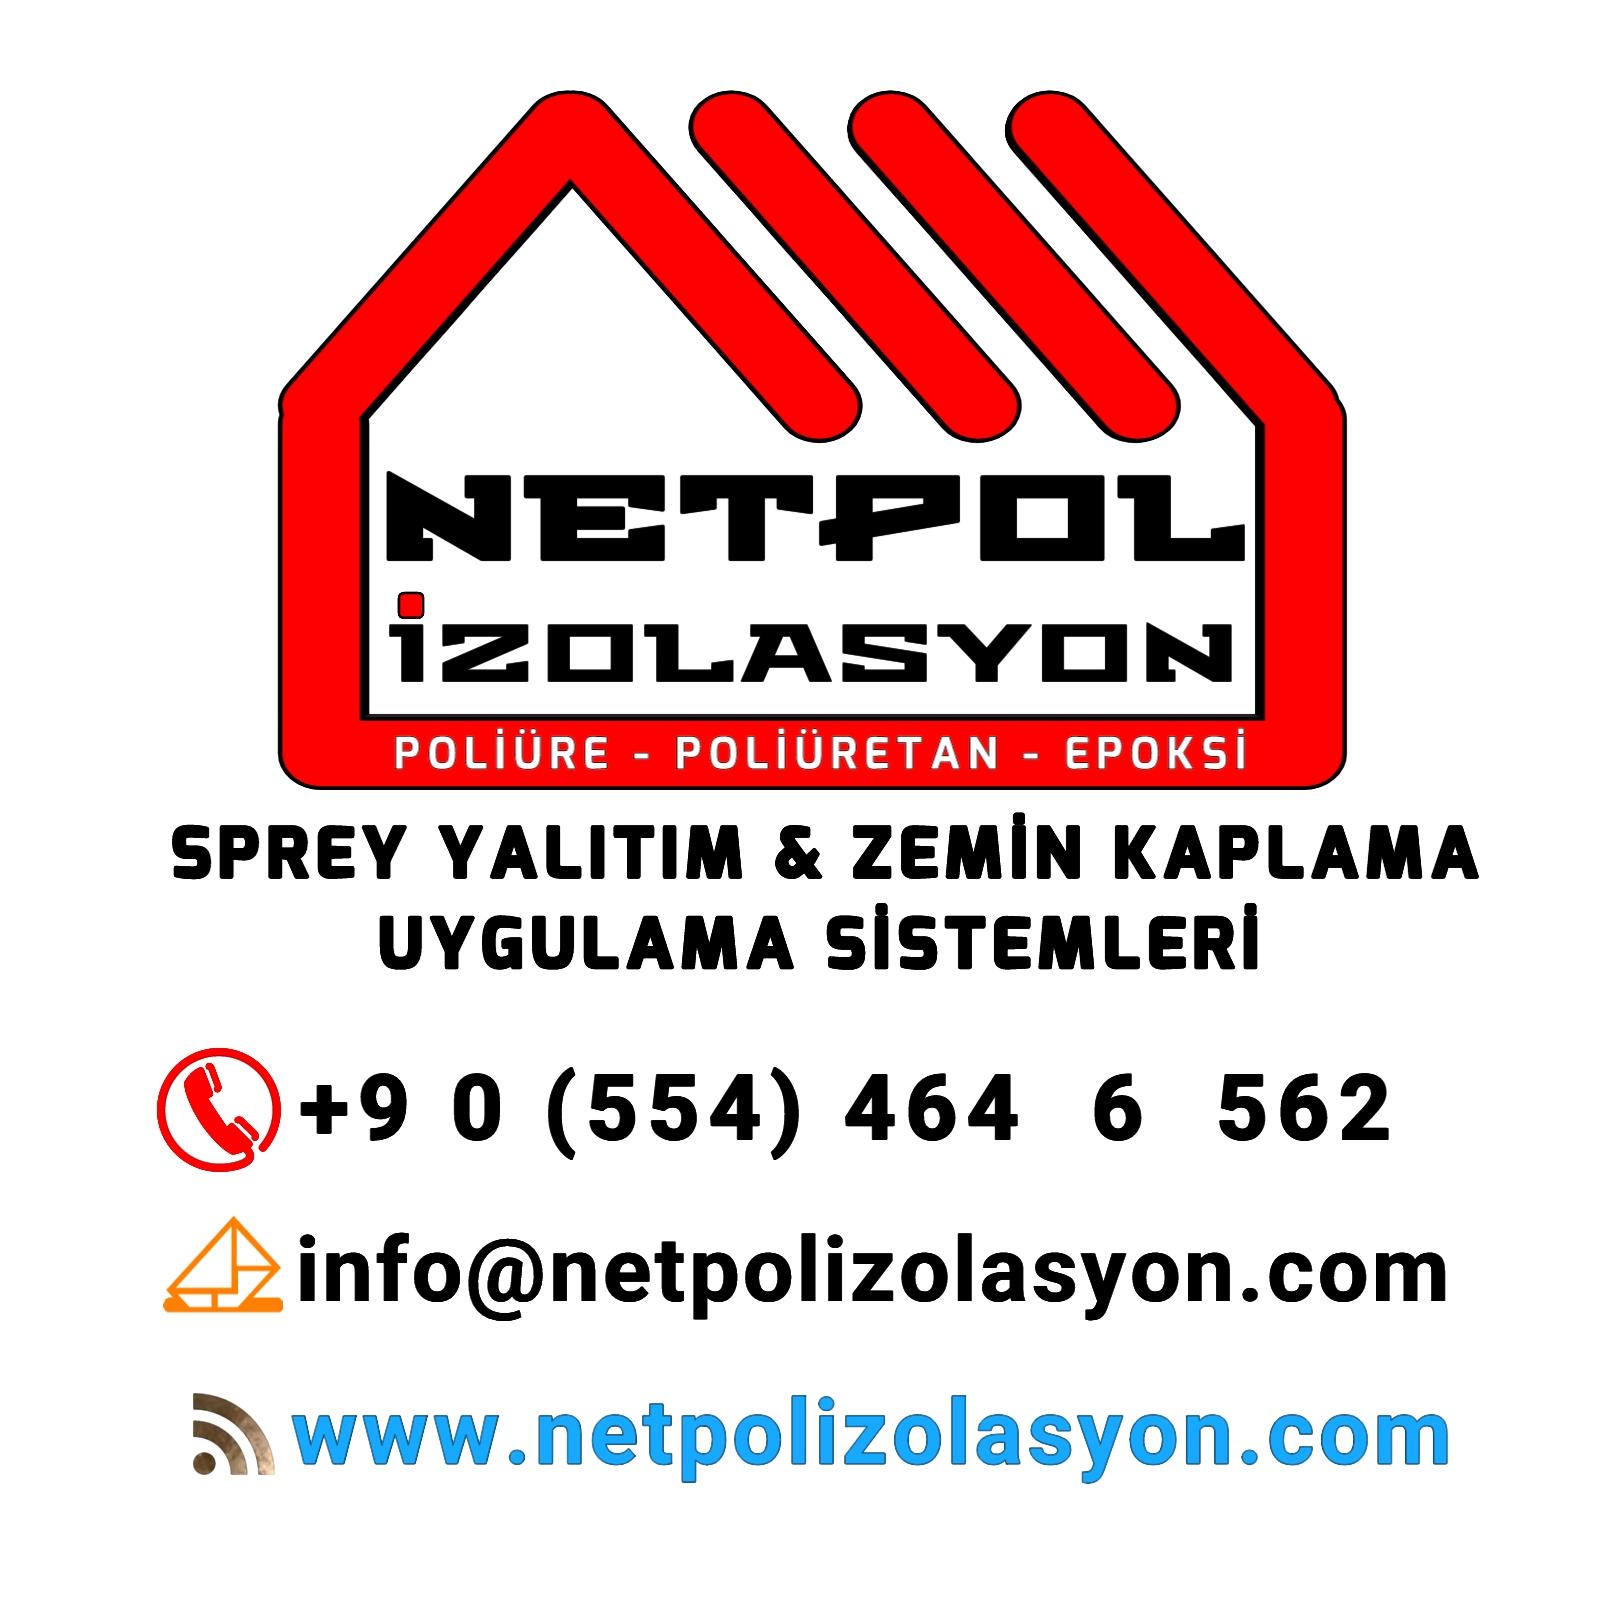 Netpol İzolasyon Sistemleri